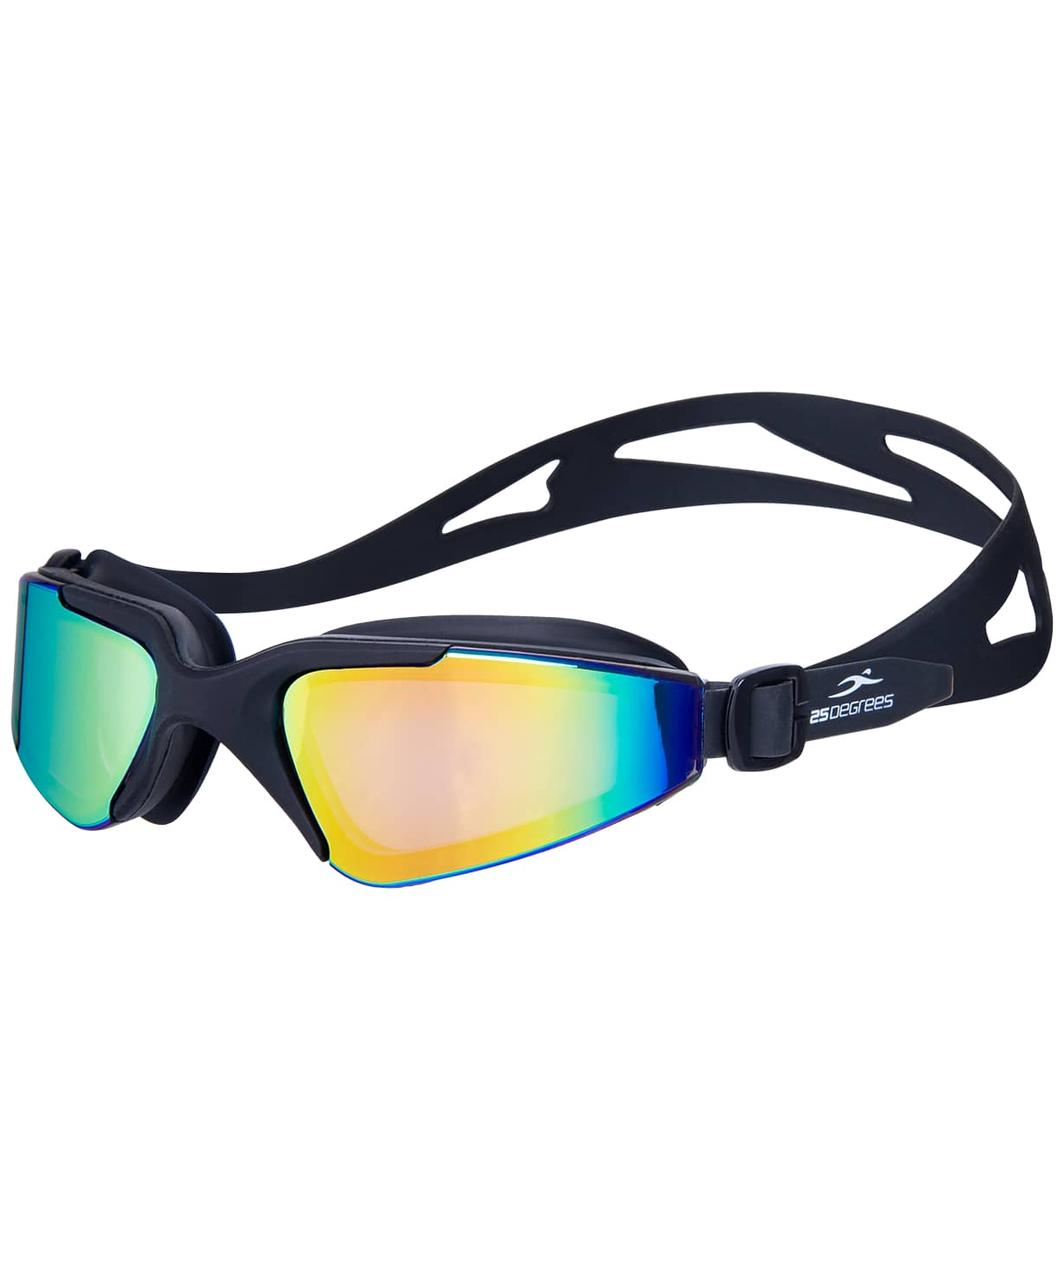 Очки для плавания Prisma Mirrored Black, подростковые 25Degrees